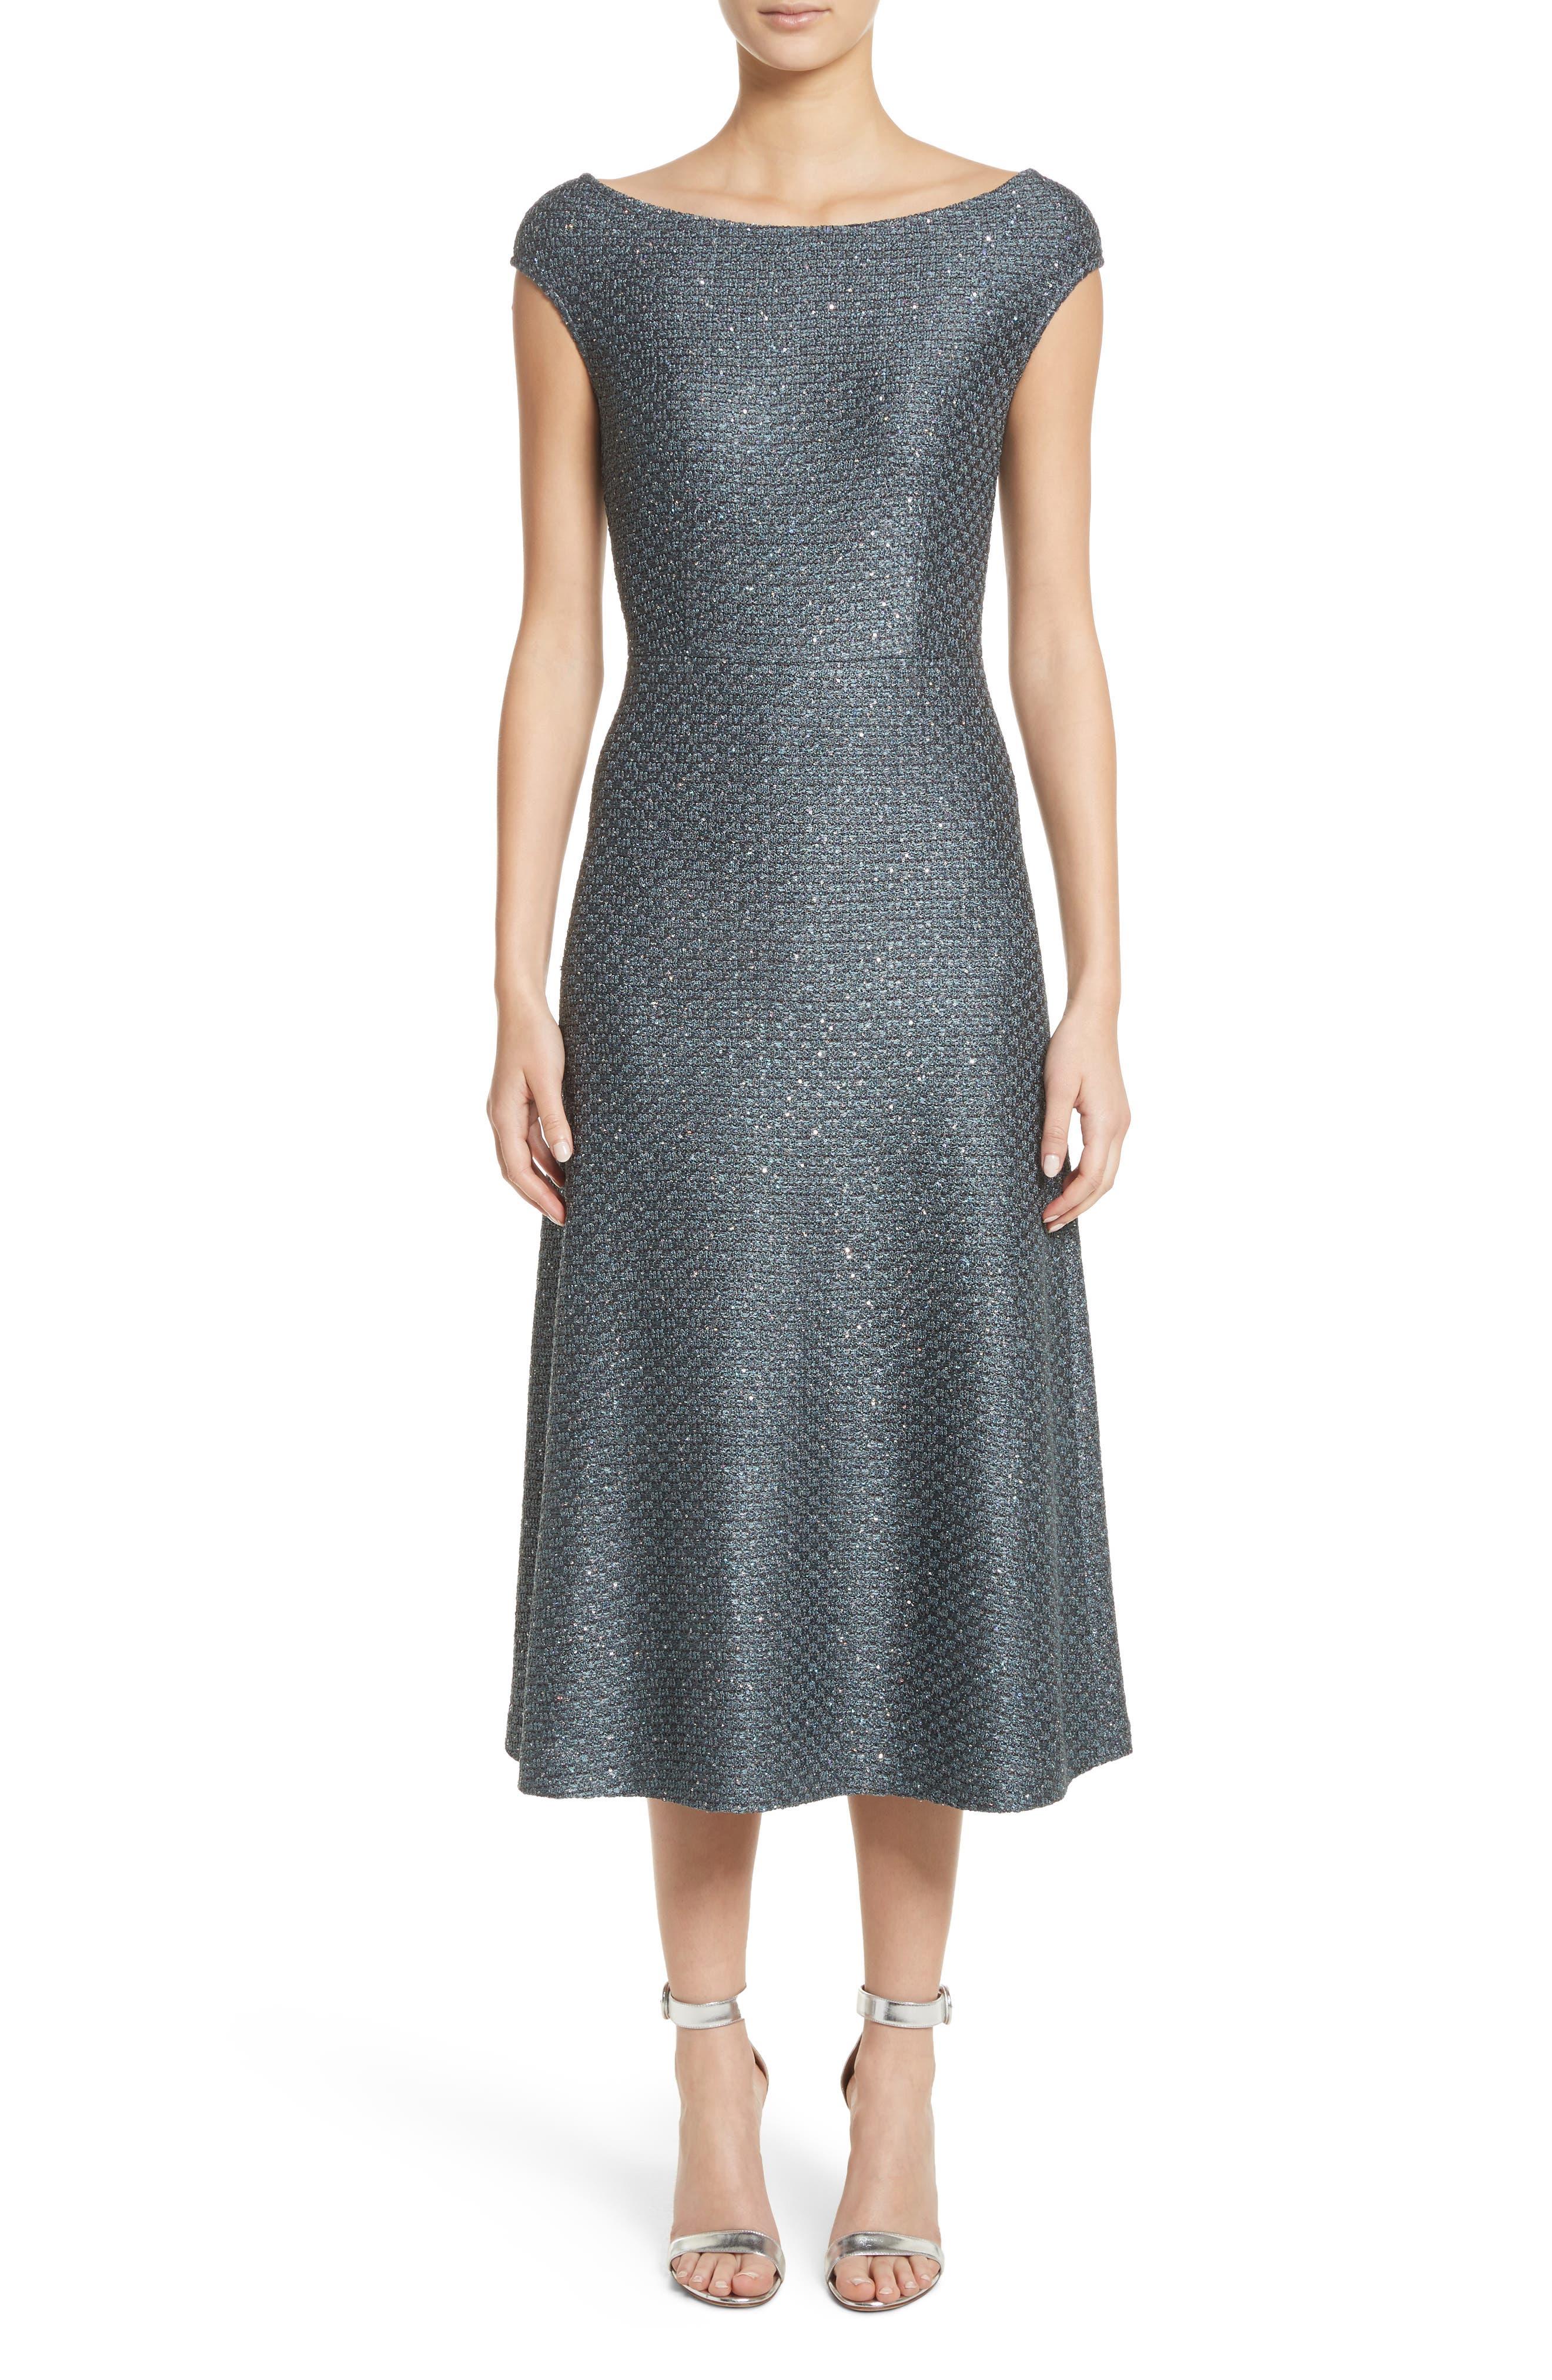 Main Image - St. John Collection Sequin Knit Midi Dress